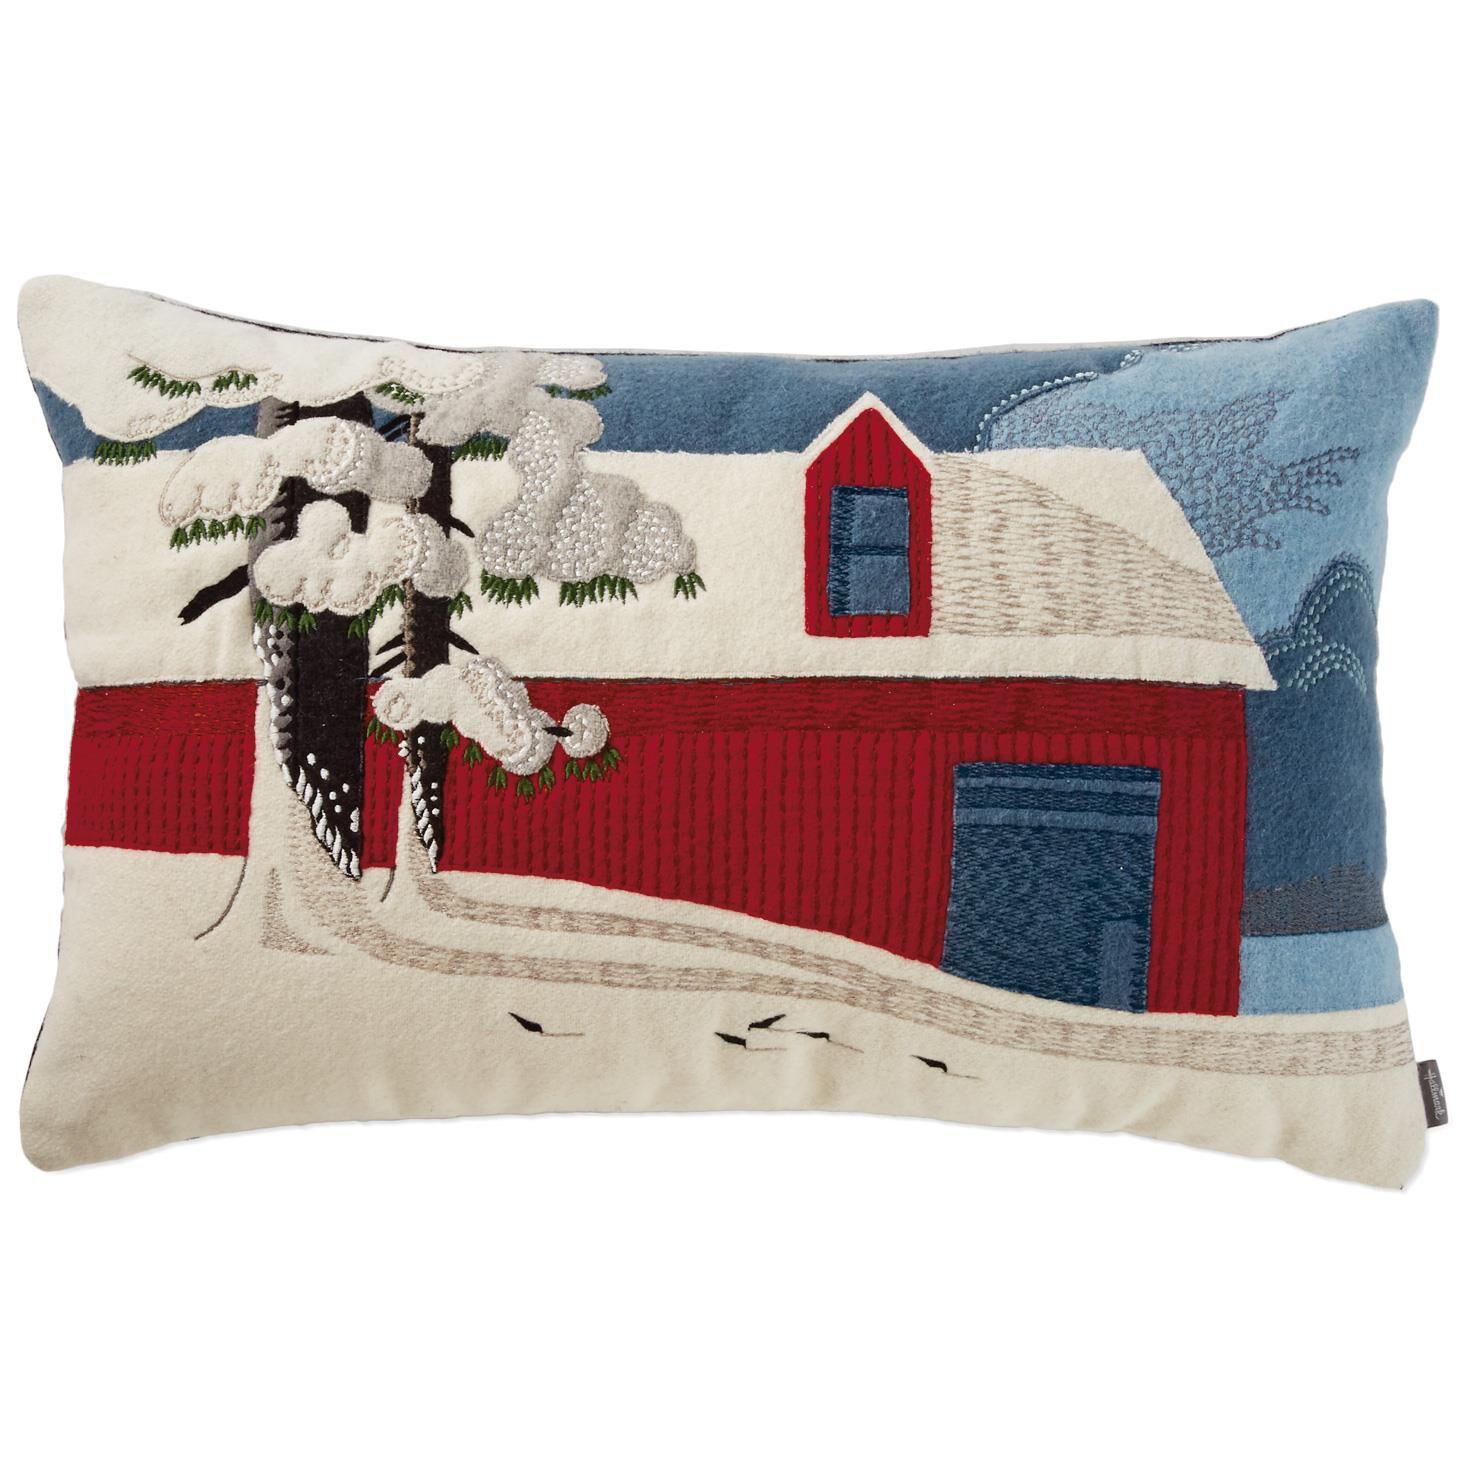 Red Barn Winter Scene Throw Pillow, 19x19 - Pillows